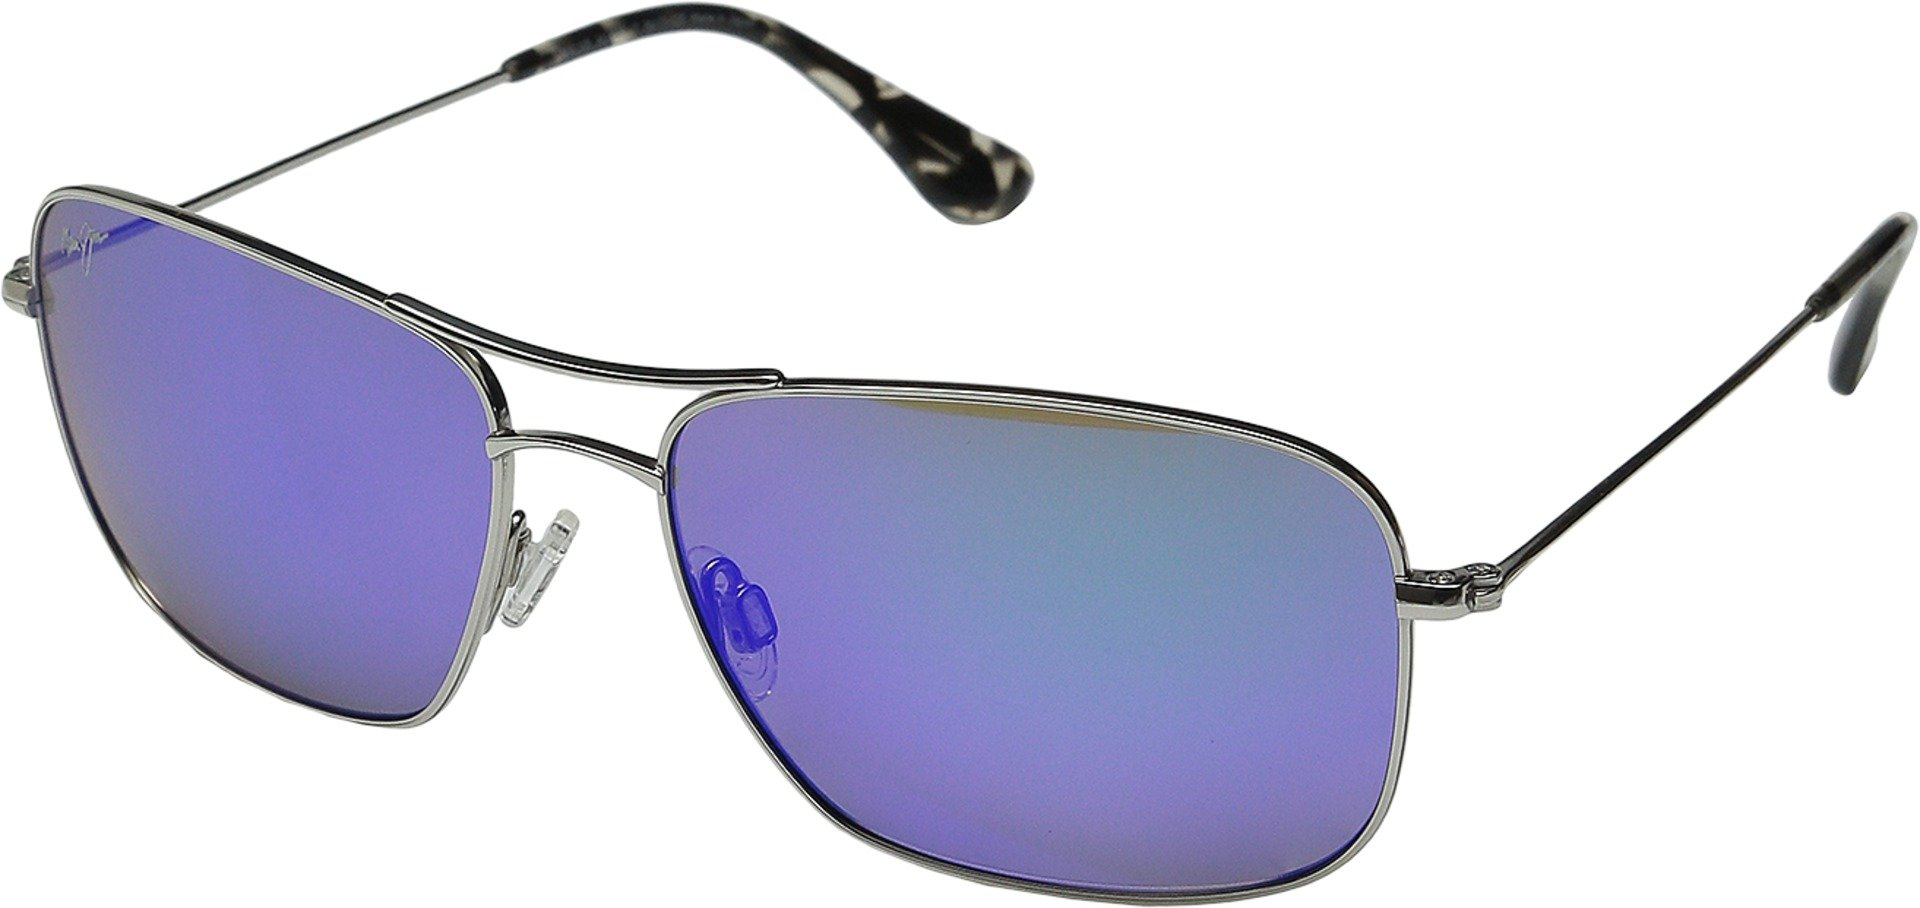 Maui Jim Wiki Wiki Polarized Sunglasses Silver / Blue Hawaii One Size